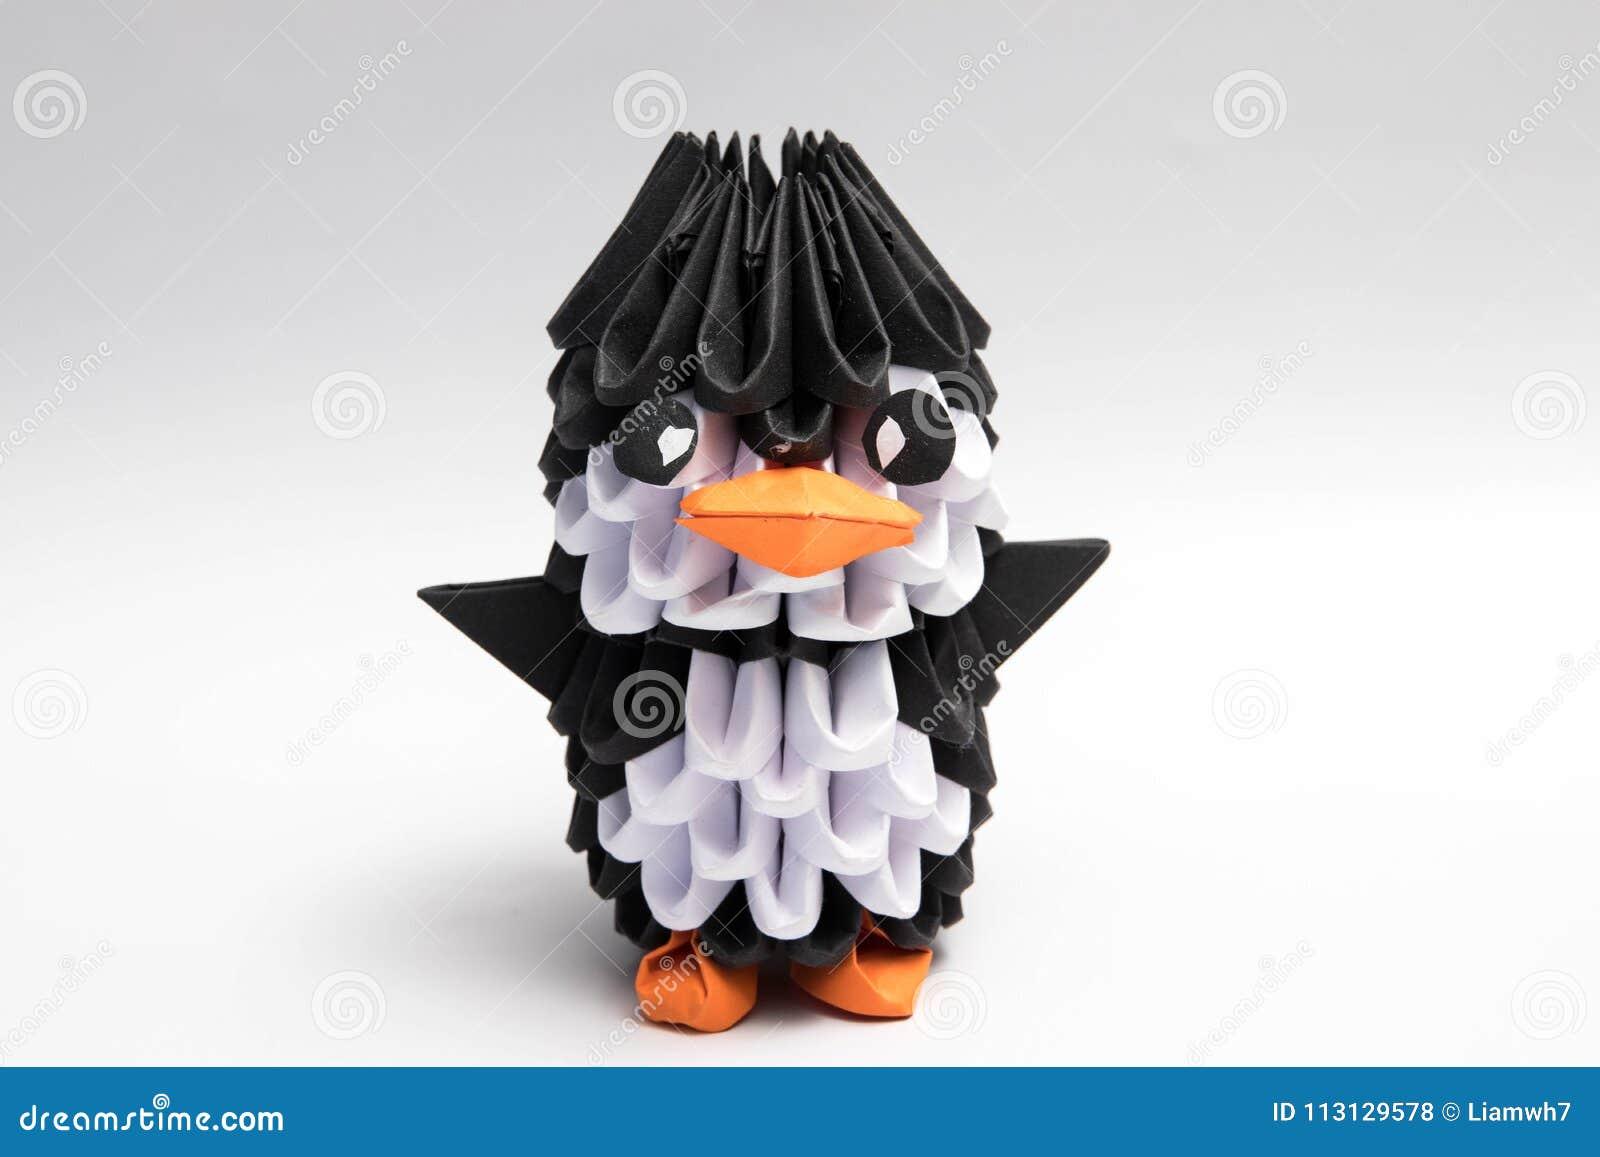 3d Origami Penguin Manchot Animal Stock Photo Image Of Geometric